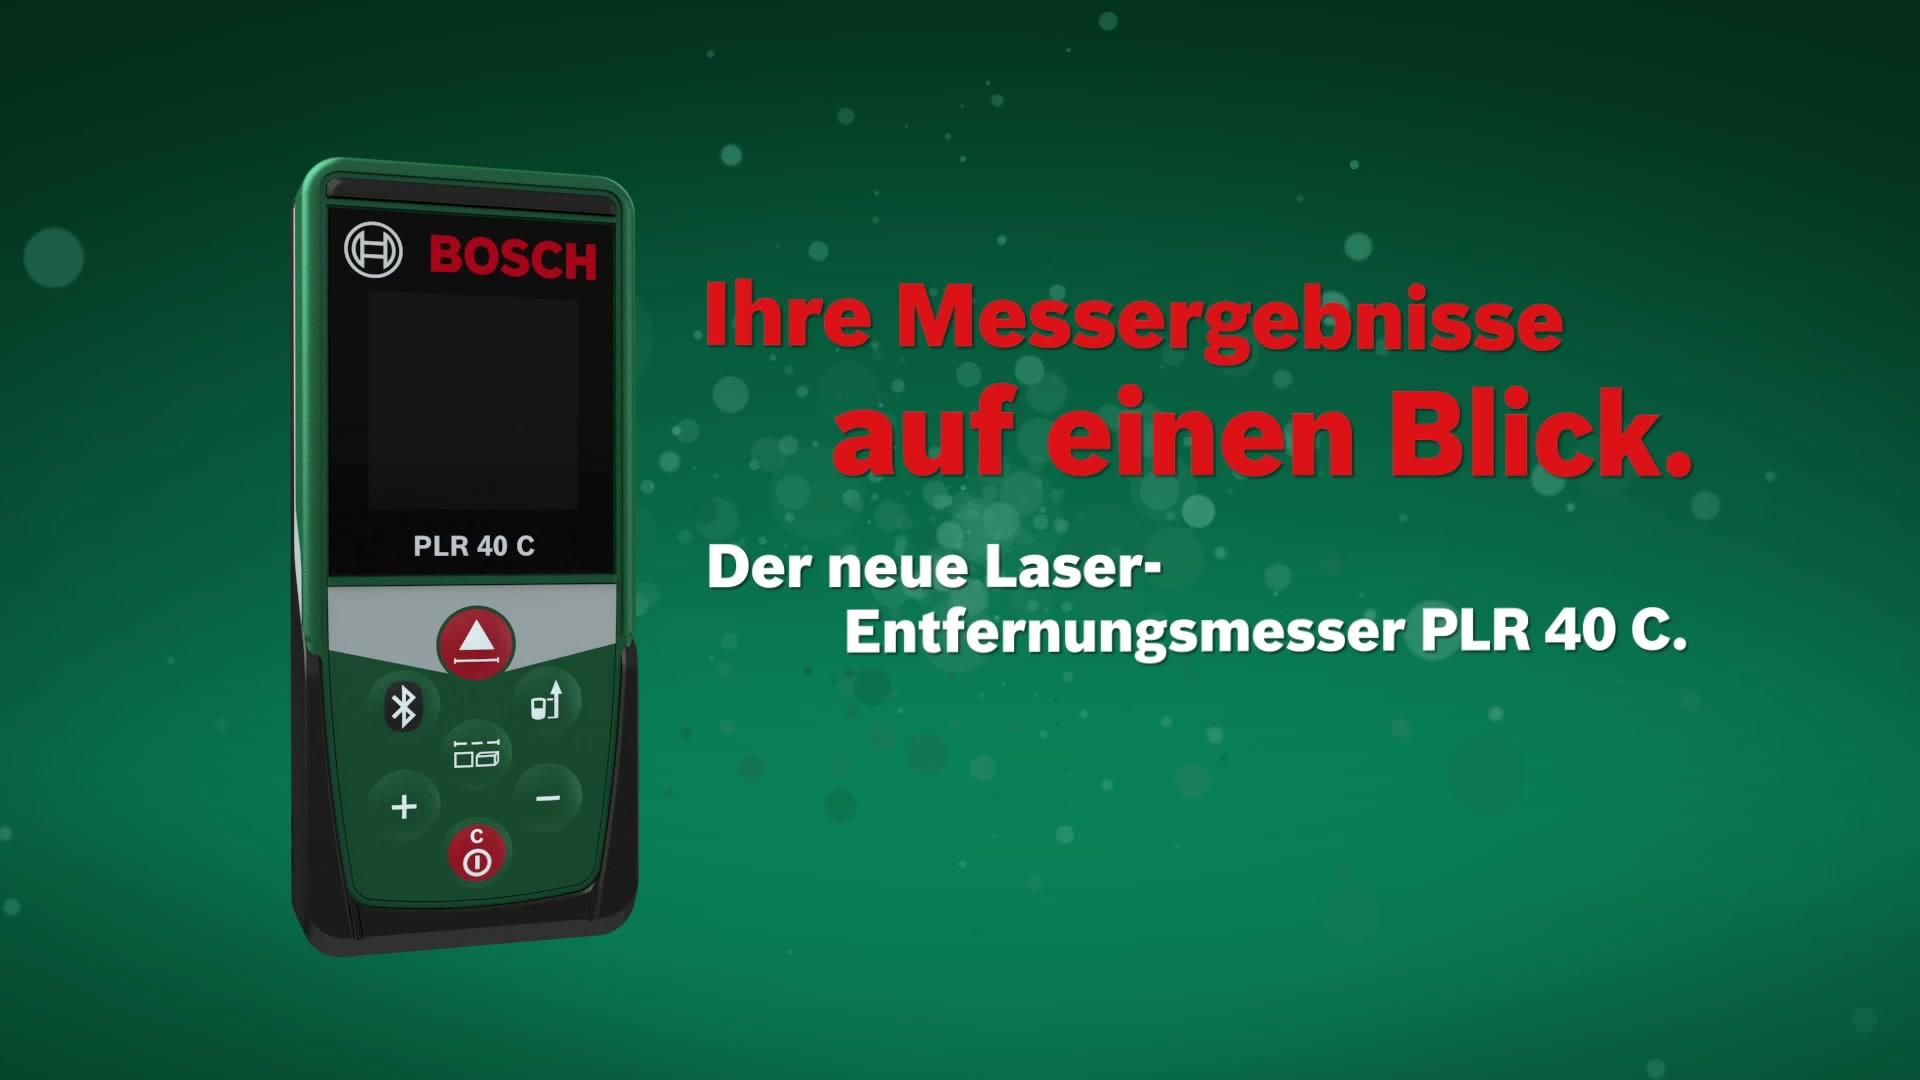 Bosch Digitaler Laser Entfernungsmesser Plr 30 C : Bosch laser entfernungsmesser plr c« hagebau